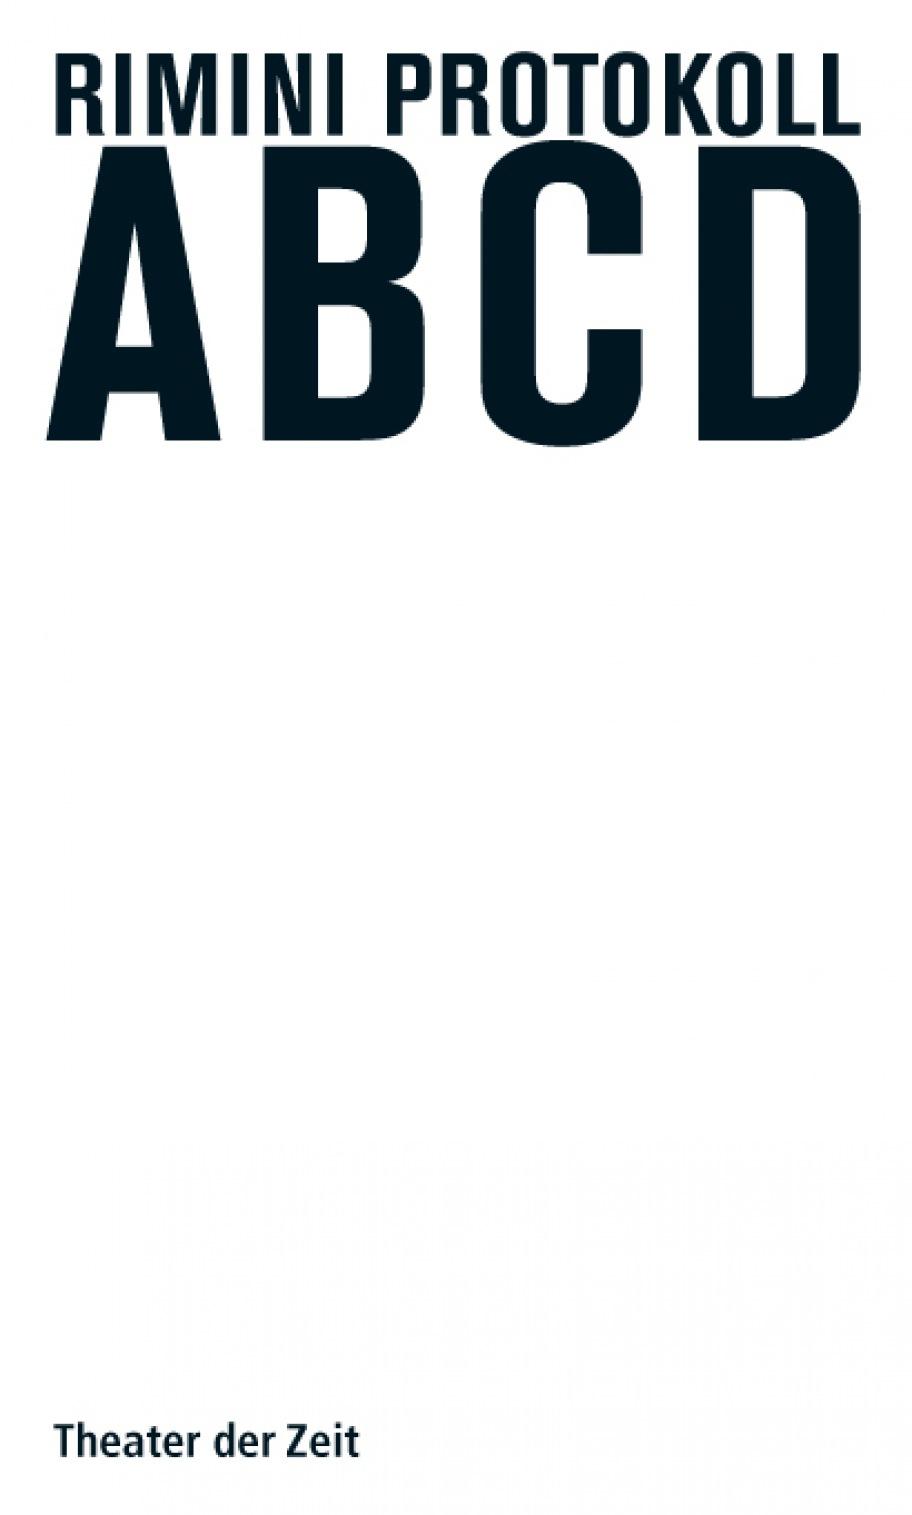 Rimini Protokoll - ABCD